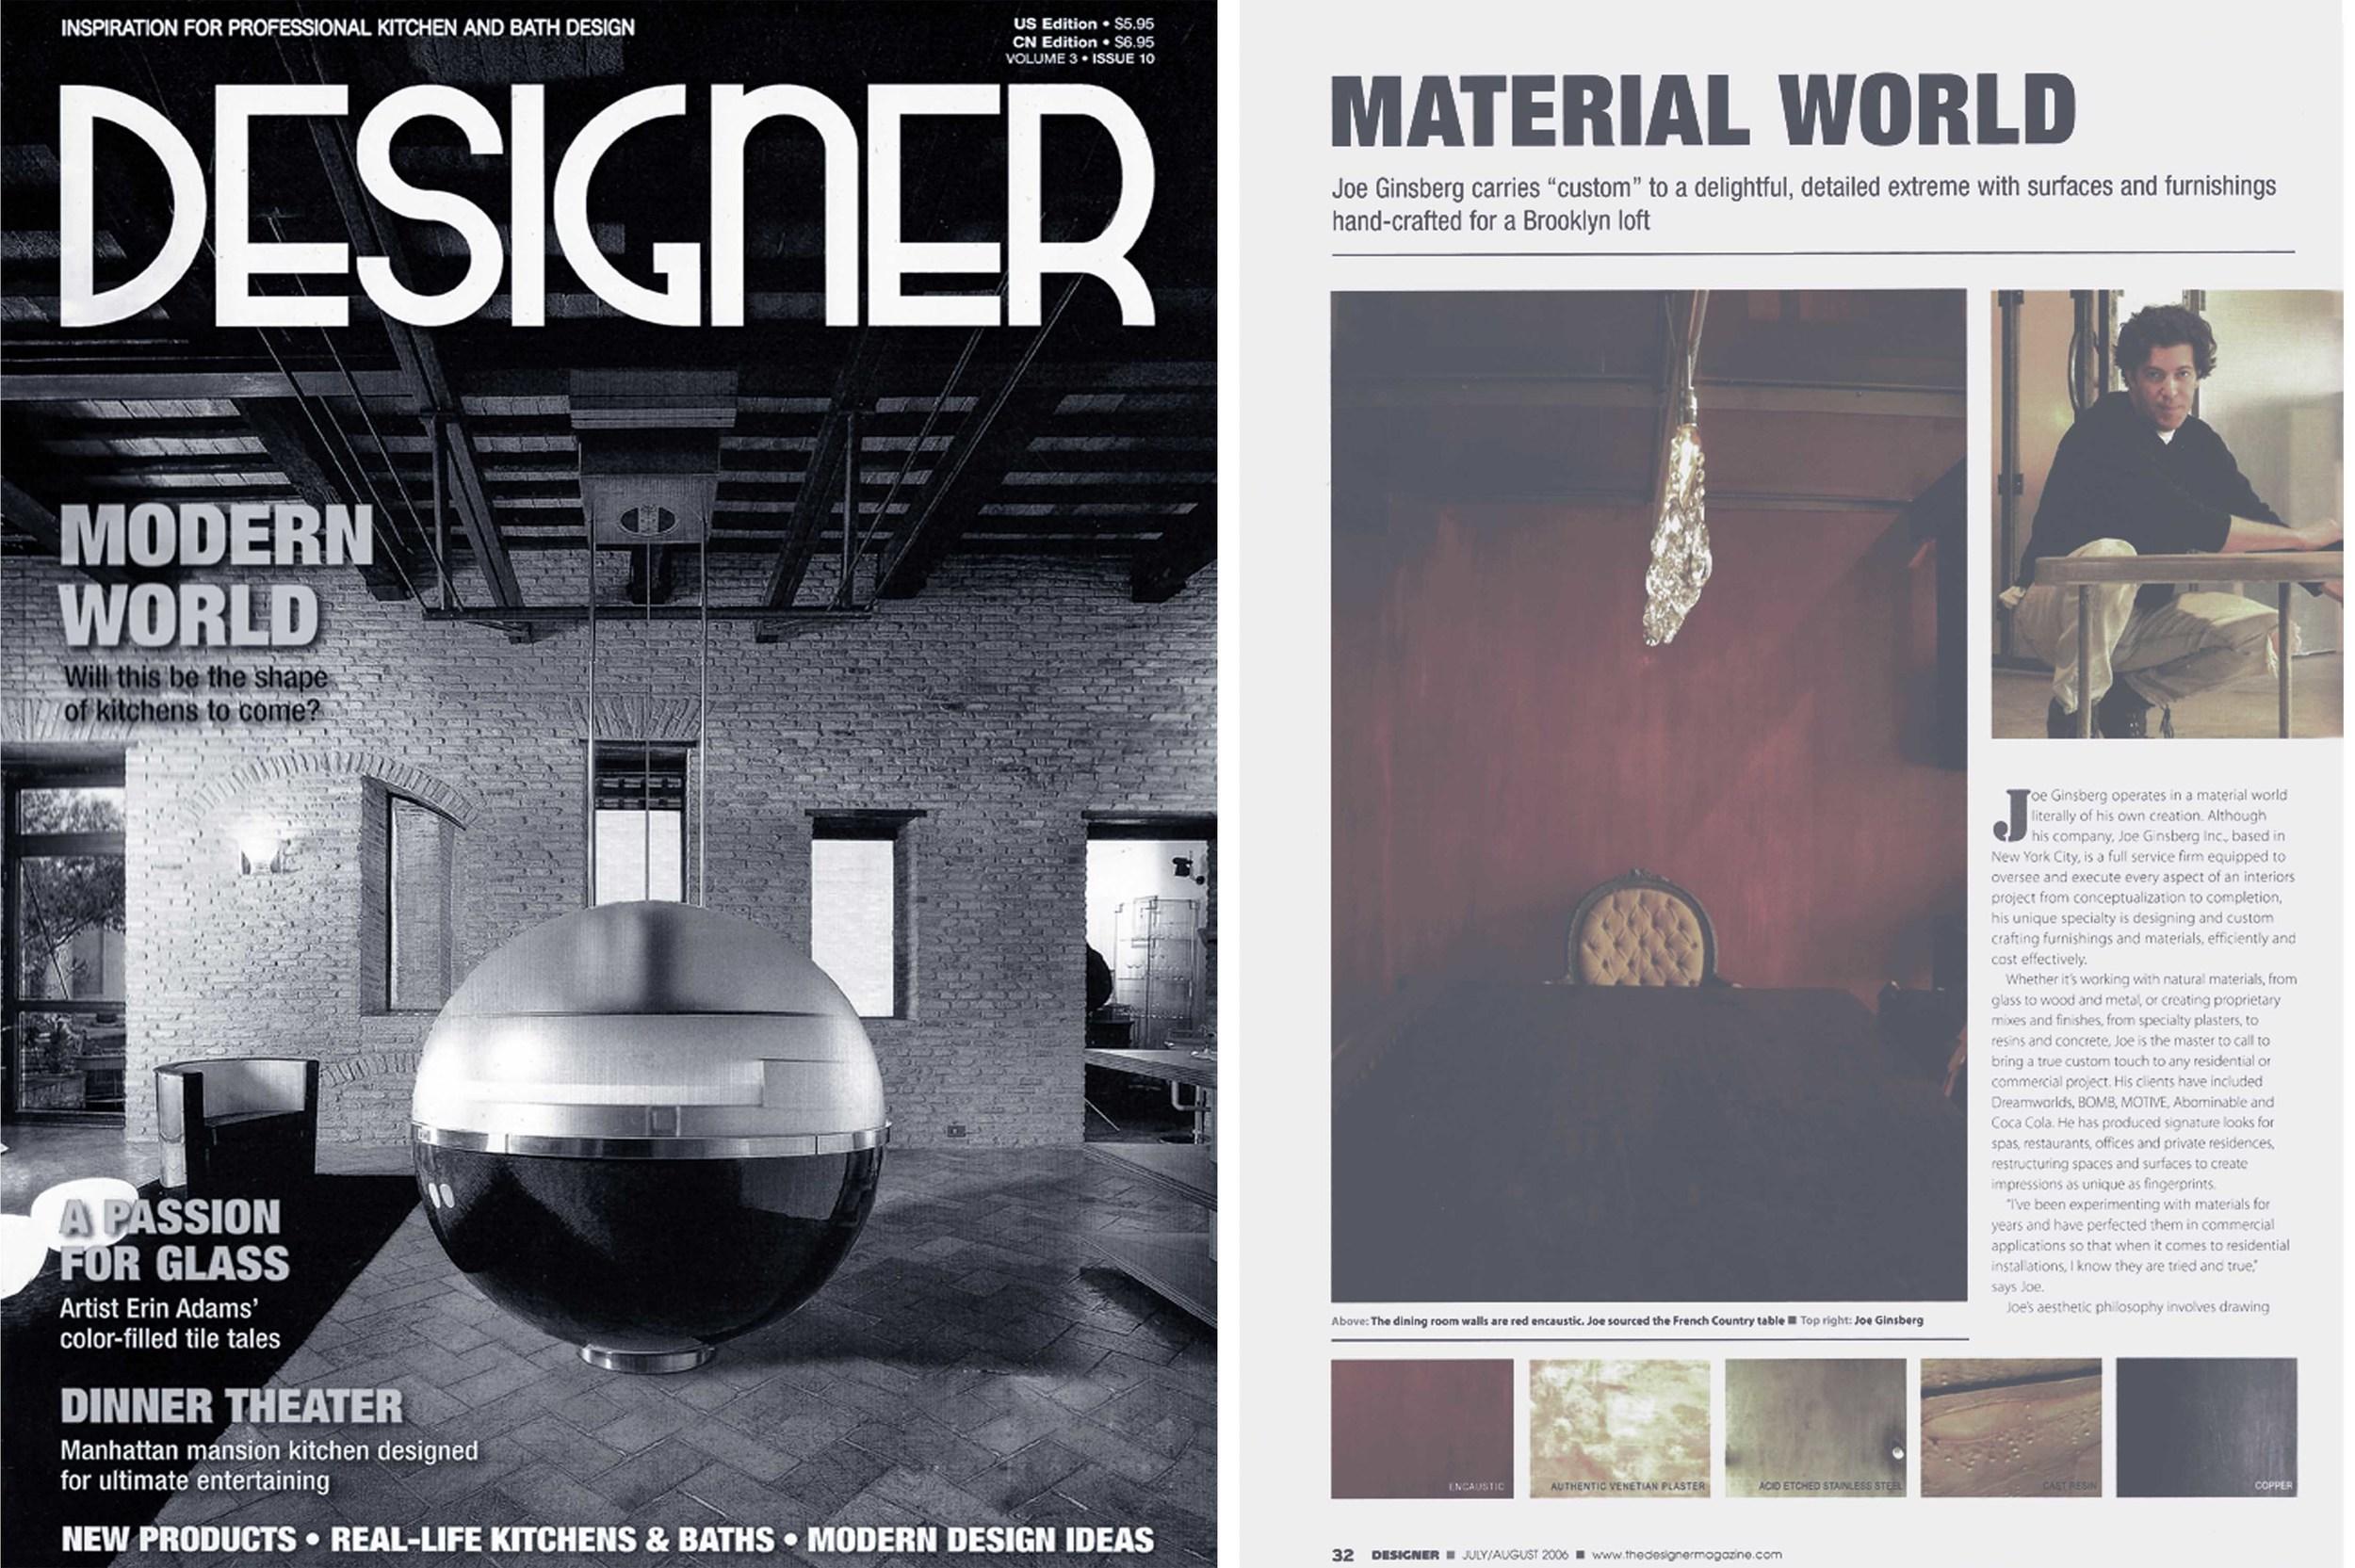 A Manhattan Interior Designer | Joe Ginsberg Design